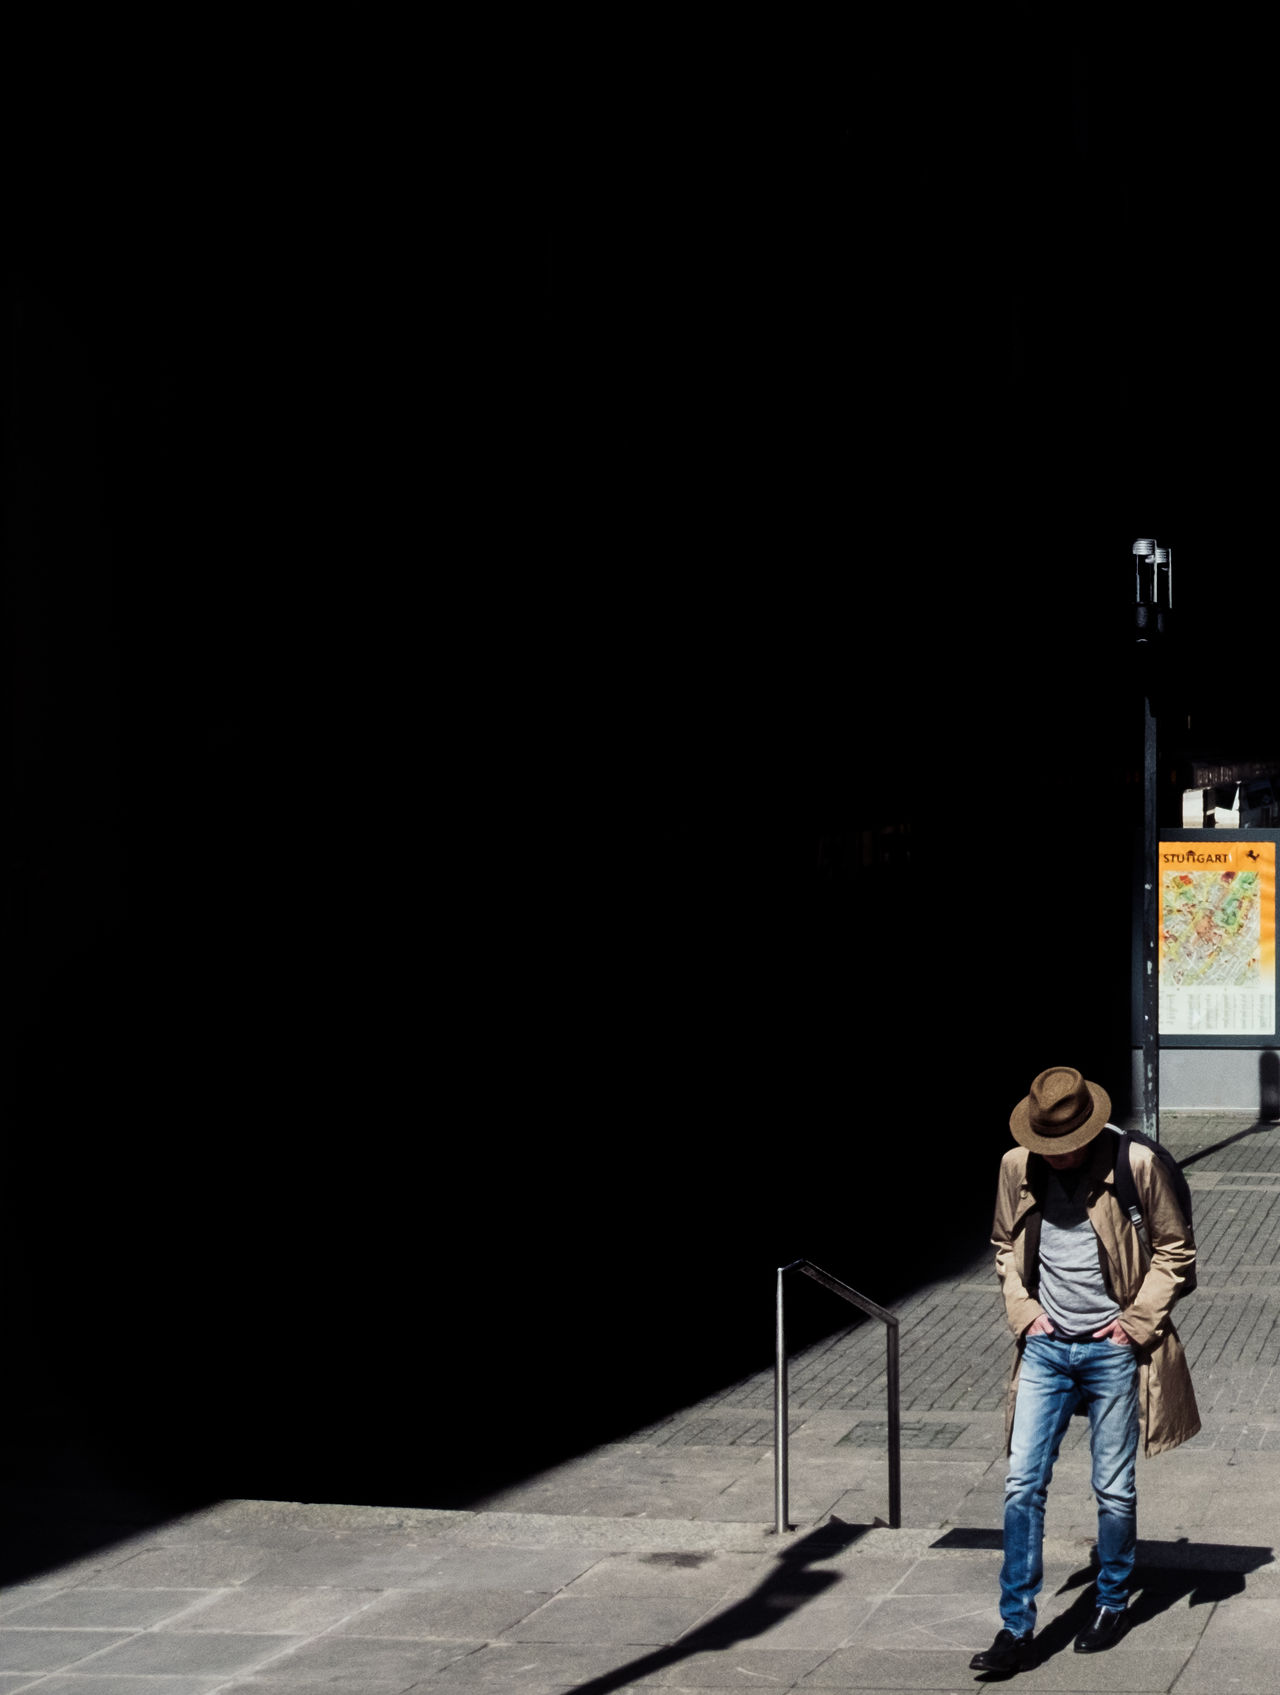 untitled The Street Photographer - 2017 EyeEm Awards The Street Photographer - 2017 EyeEm Awards Fresh on Market 2017